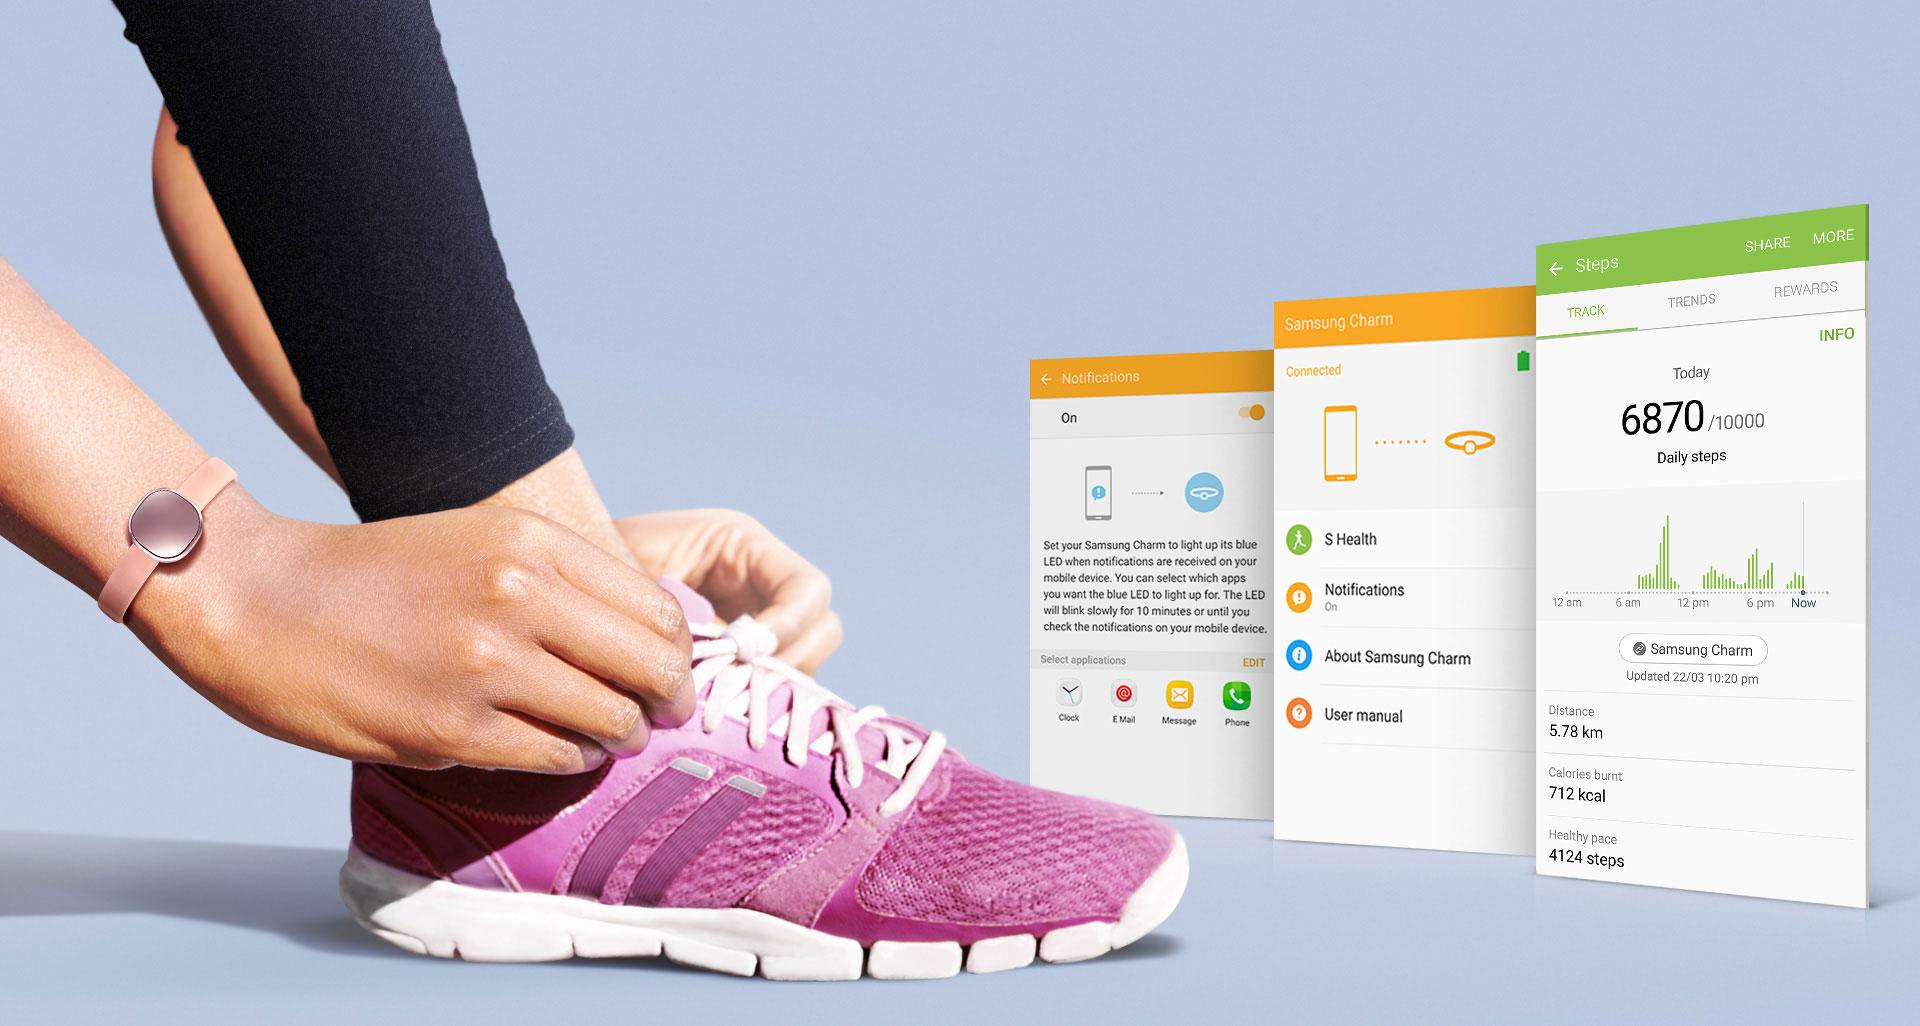 Samsung Charm: il nuovo fitness band con finiture luxury